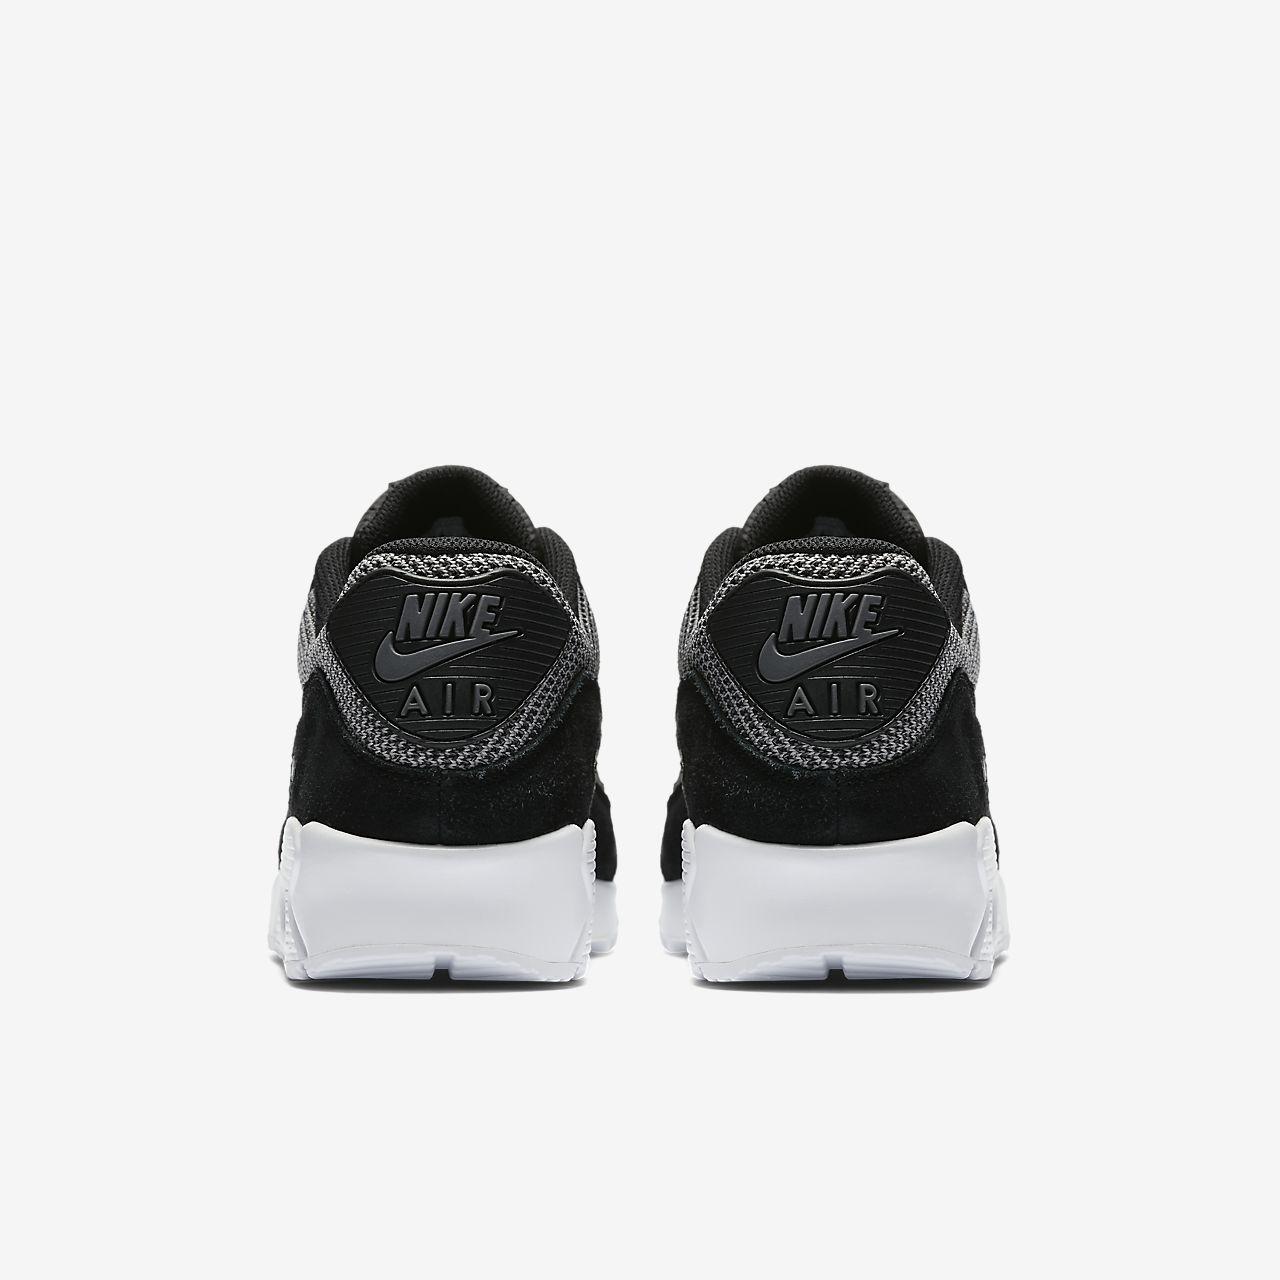 nike air max 90 essential chaussure pour homme